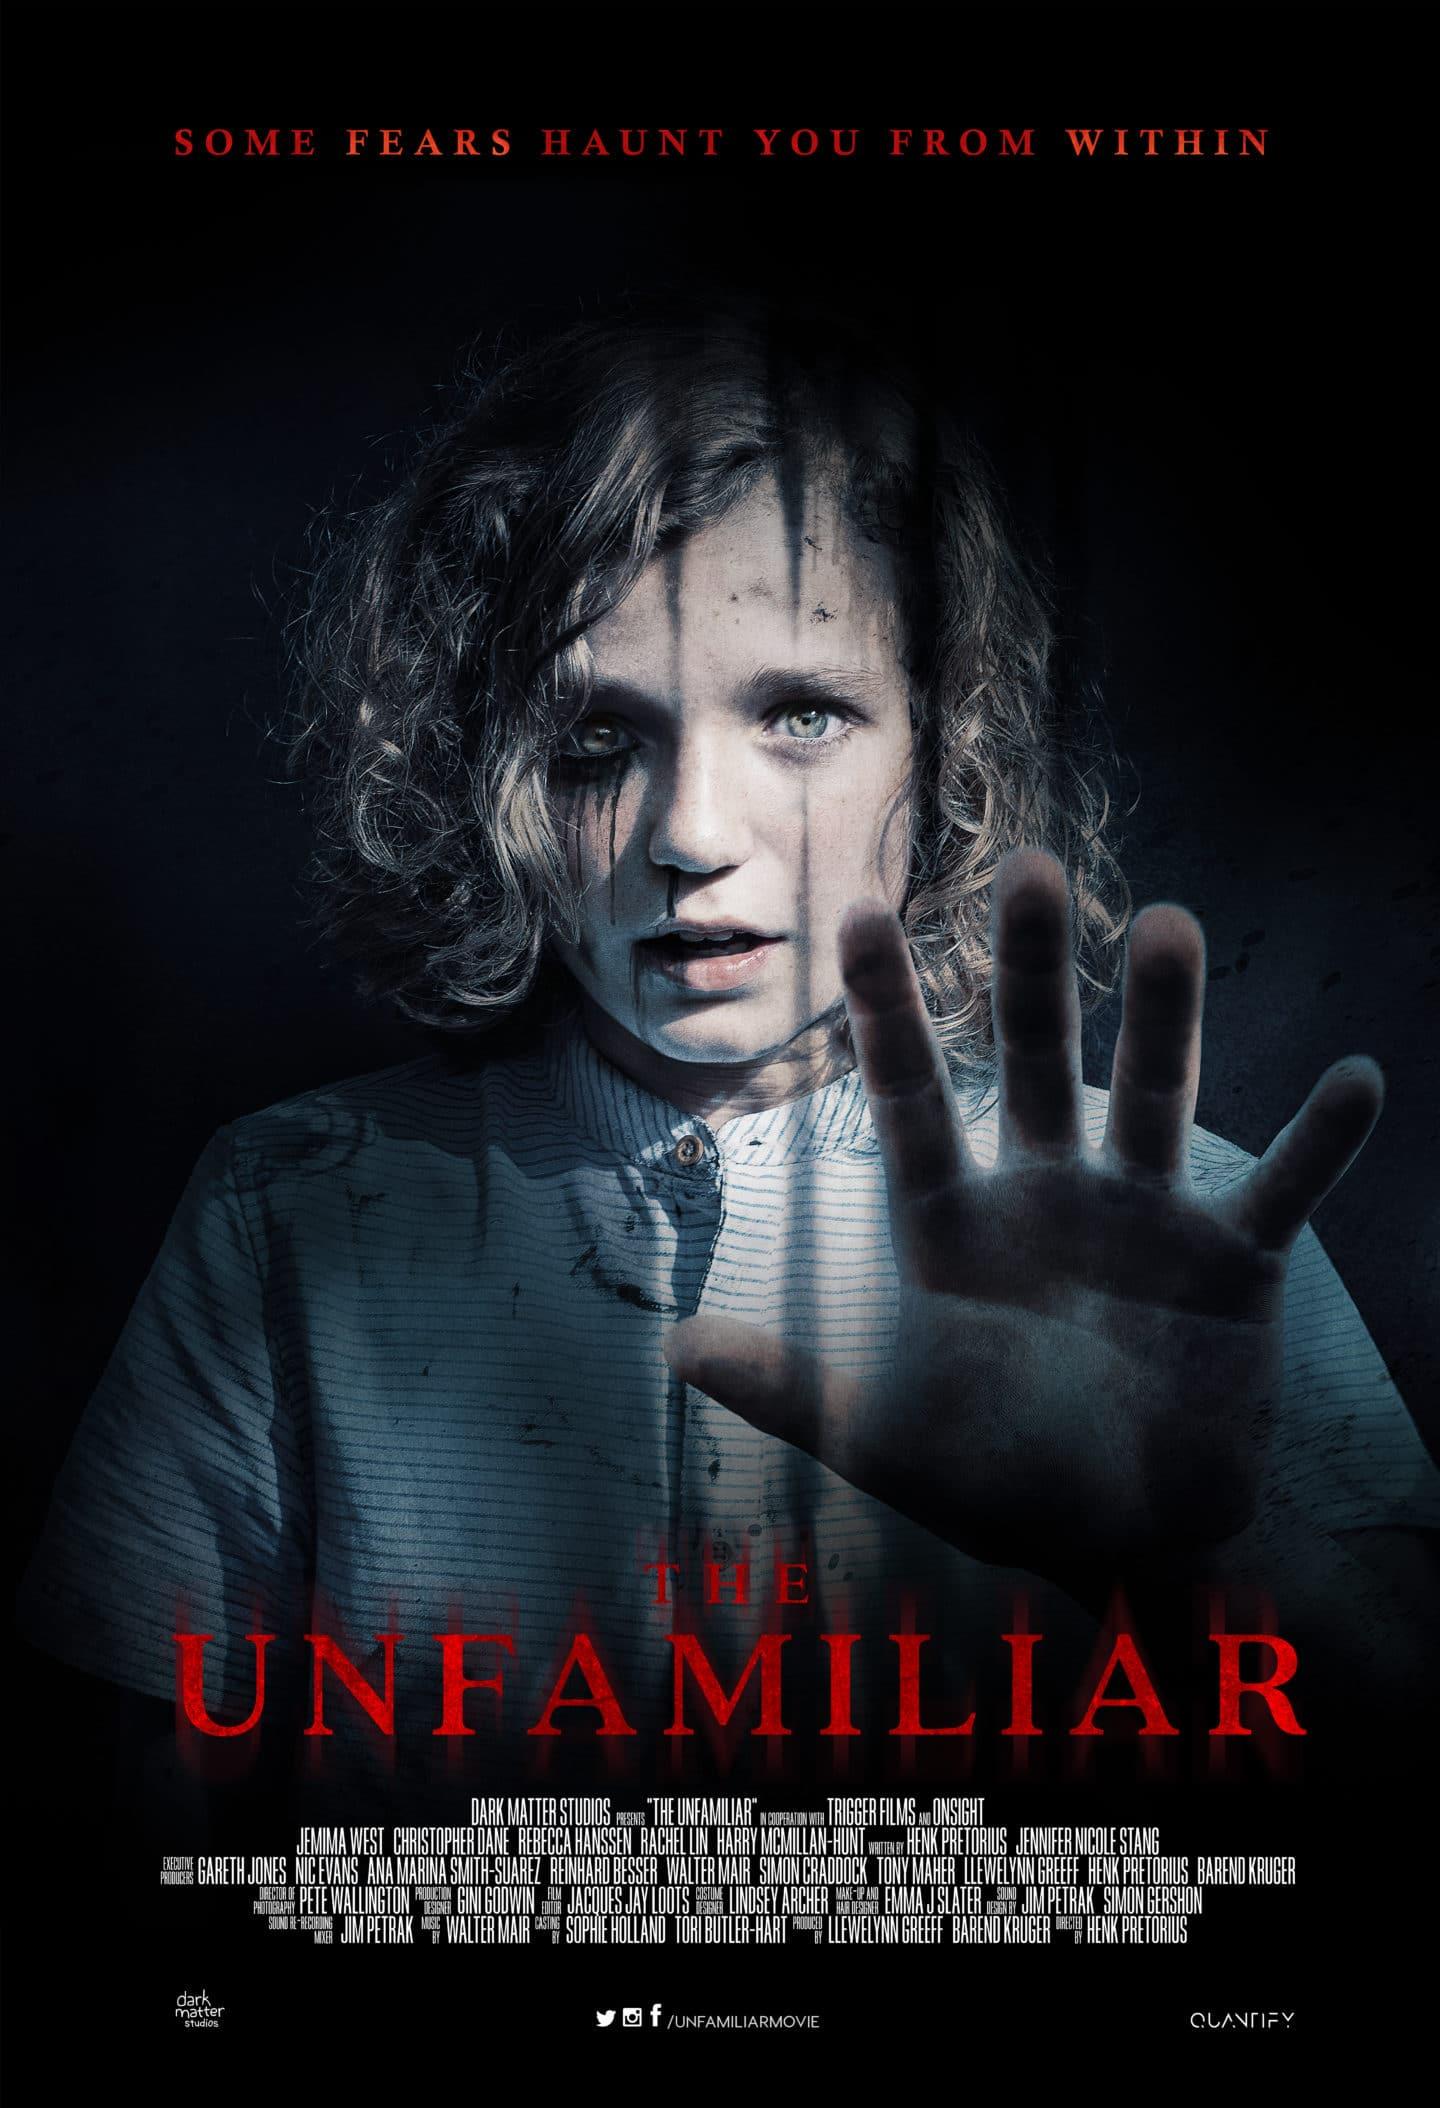 The Unfamiliar – Teaser Poster